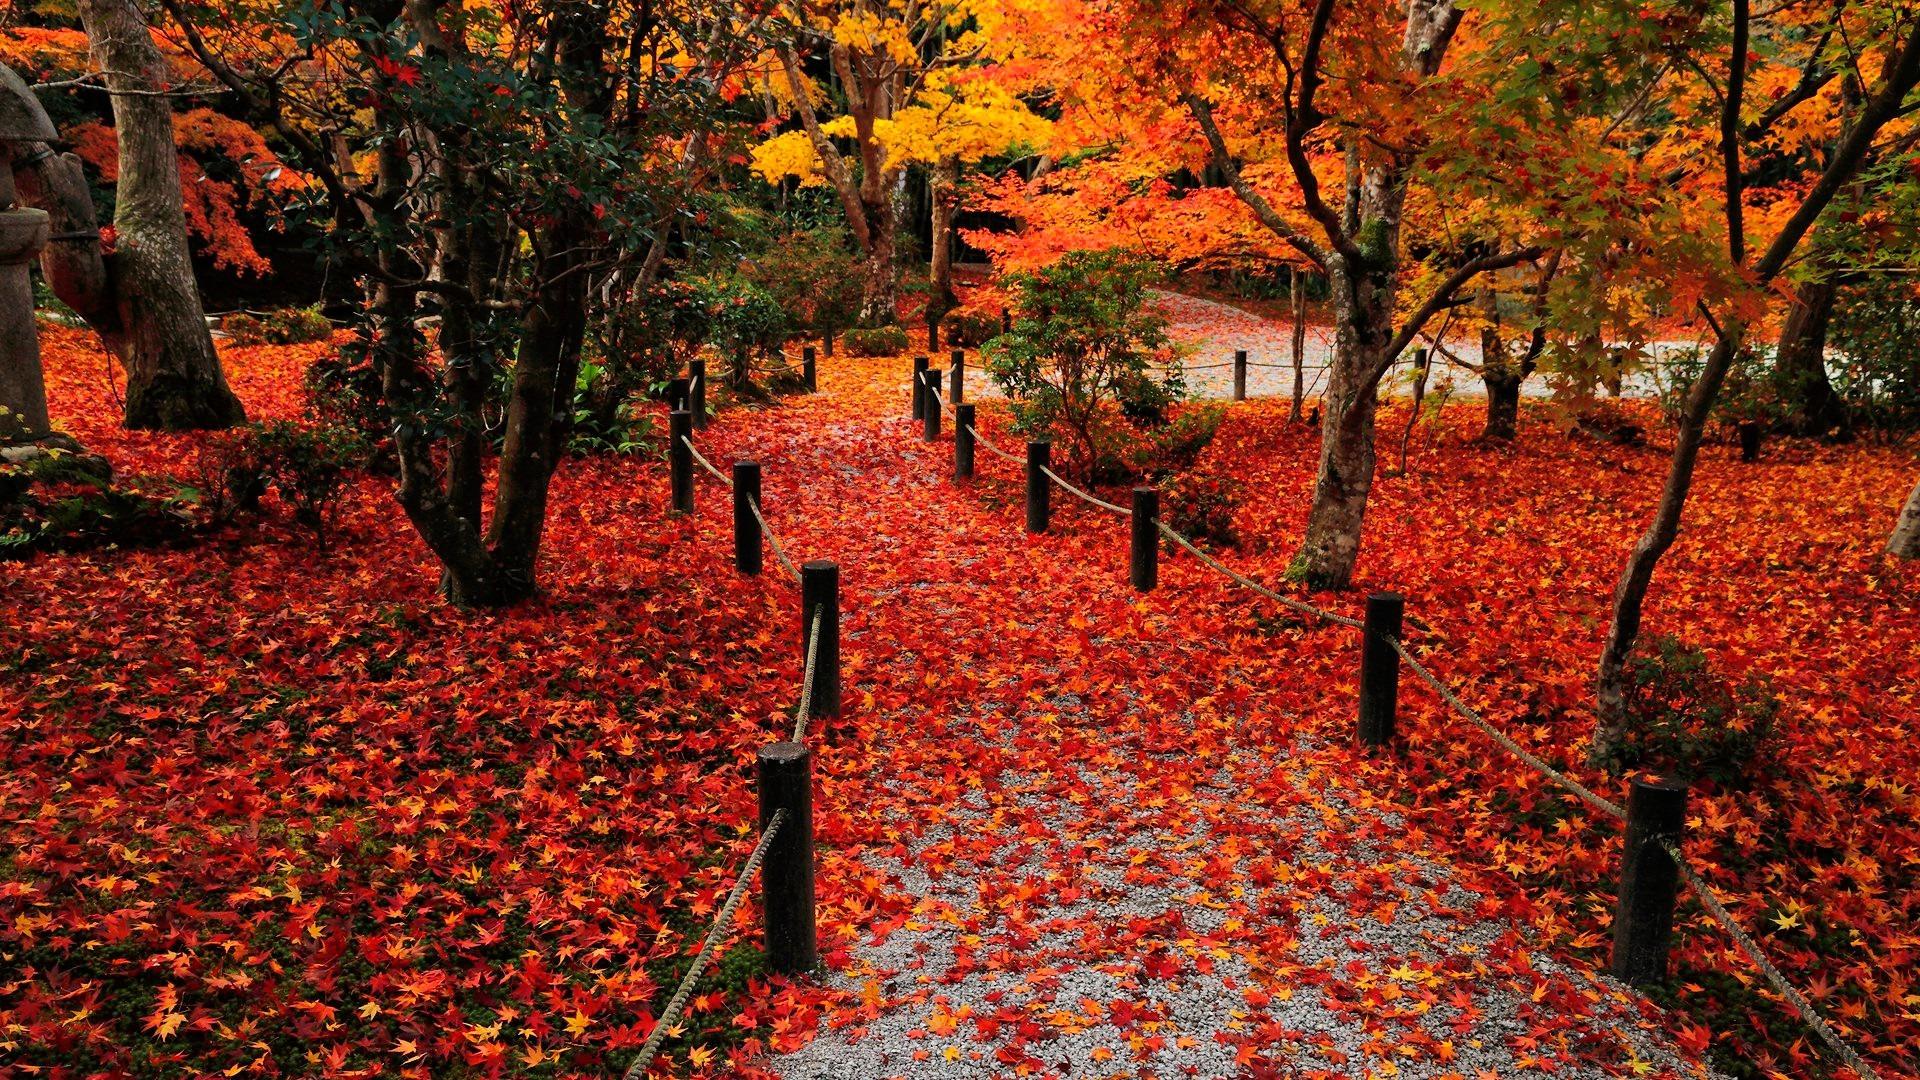 autumn background images